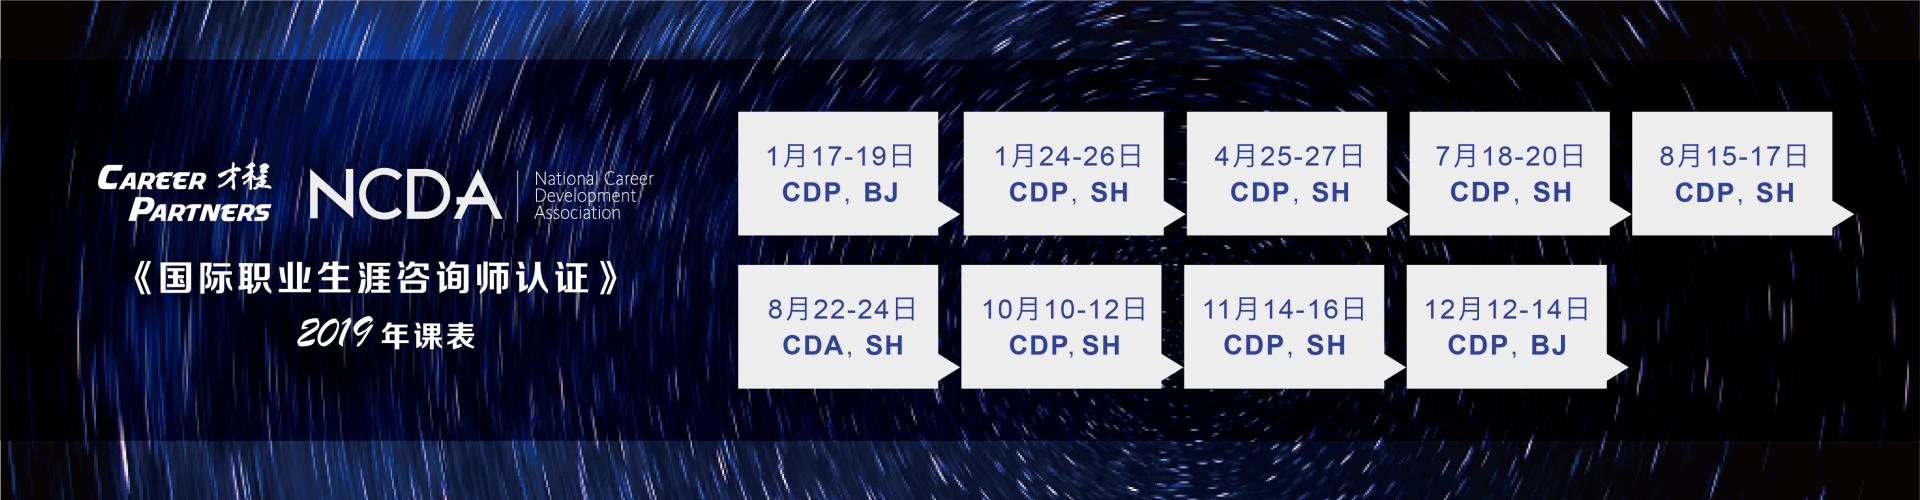 CDP calendar